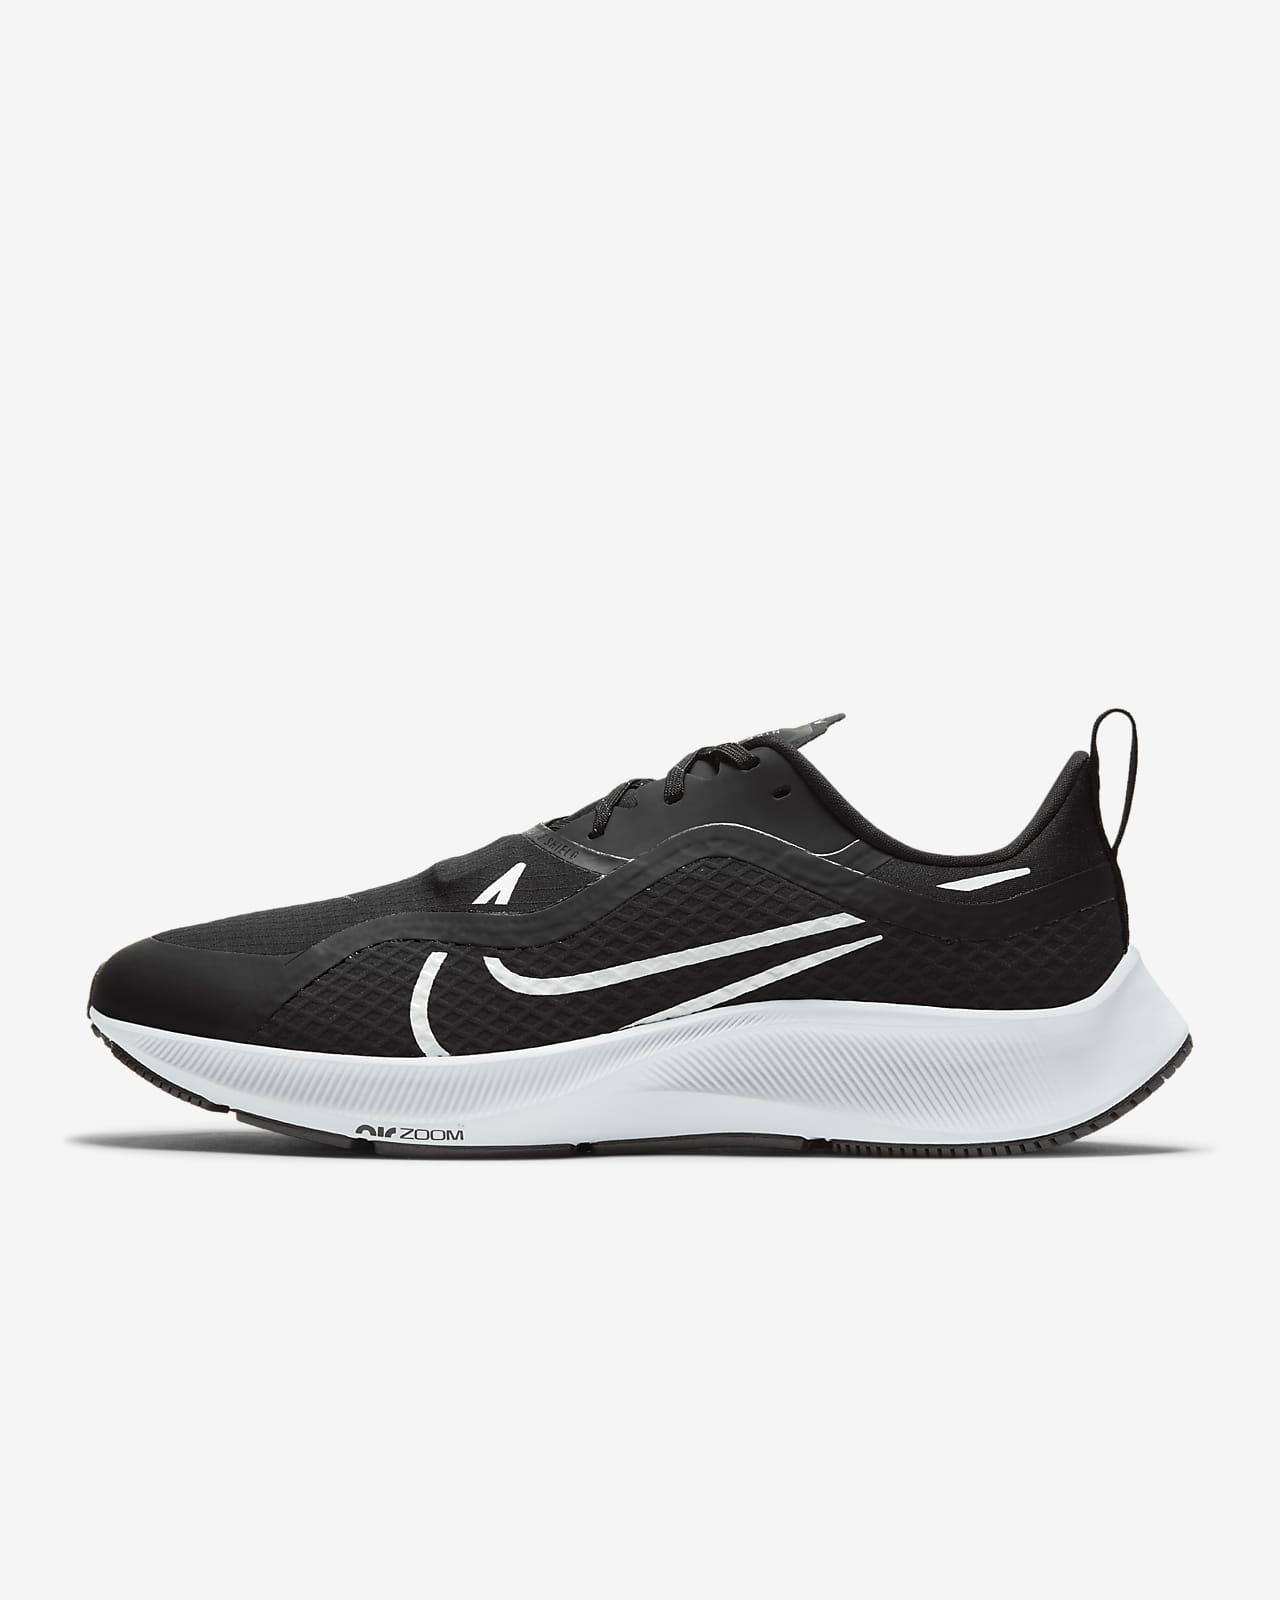 Chaussure de running Nike Air Zoom Pegasus 37 Shield pour Homme